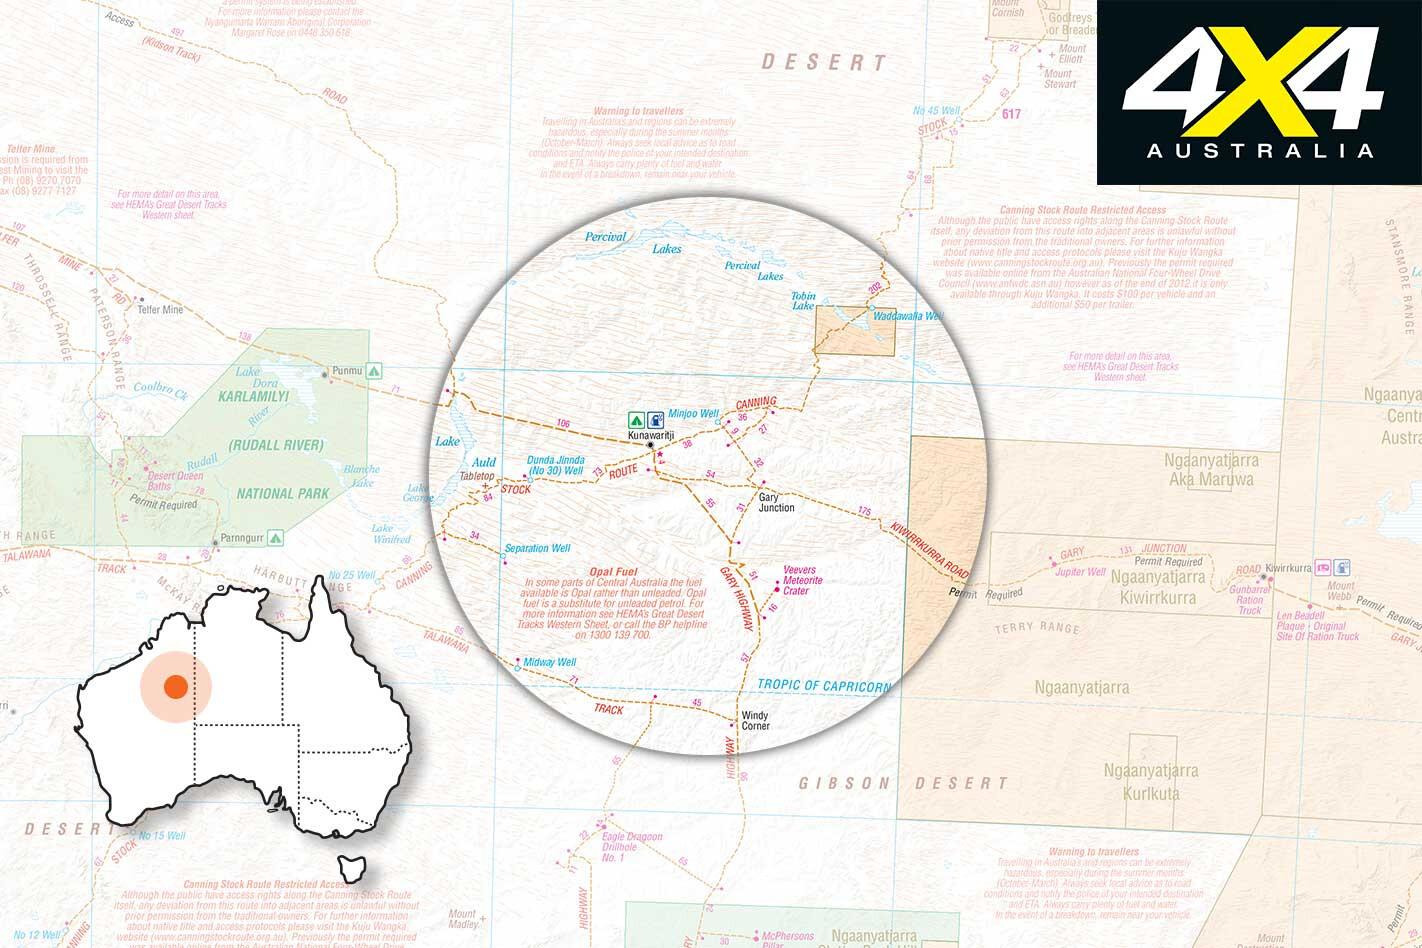 WA Great Sandy Desert 4 X 4 Trip Guide Map Jpg